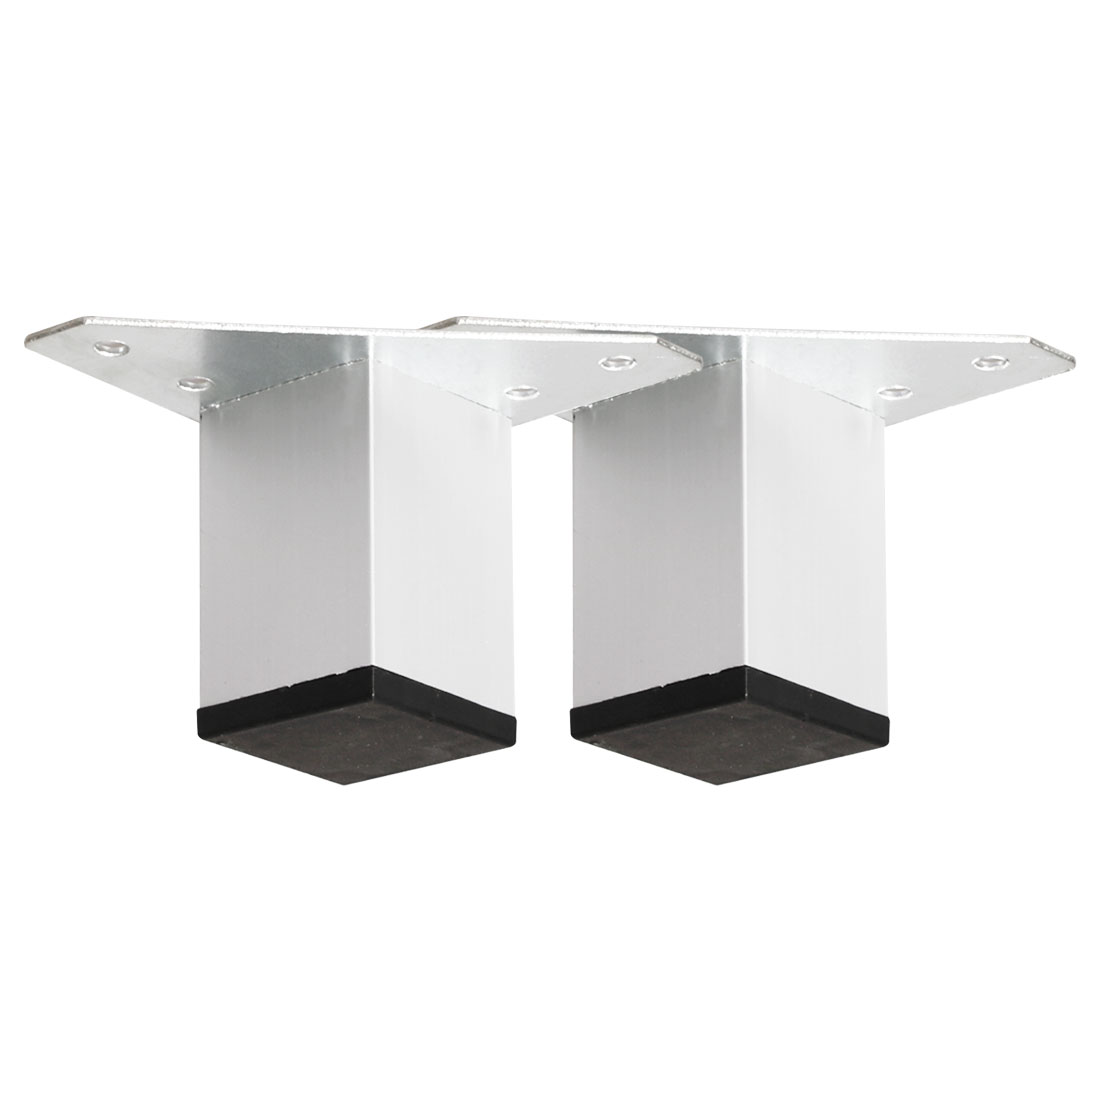 "2"" Furniture Leg Aluminium Alloy Sofa Feet Replacement Height Adjuster 2pcs"